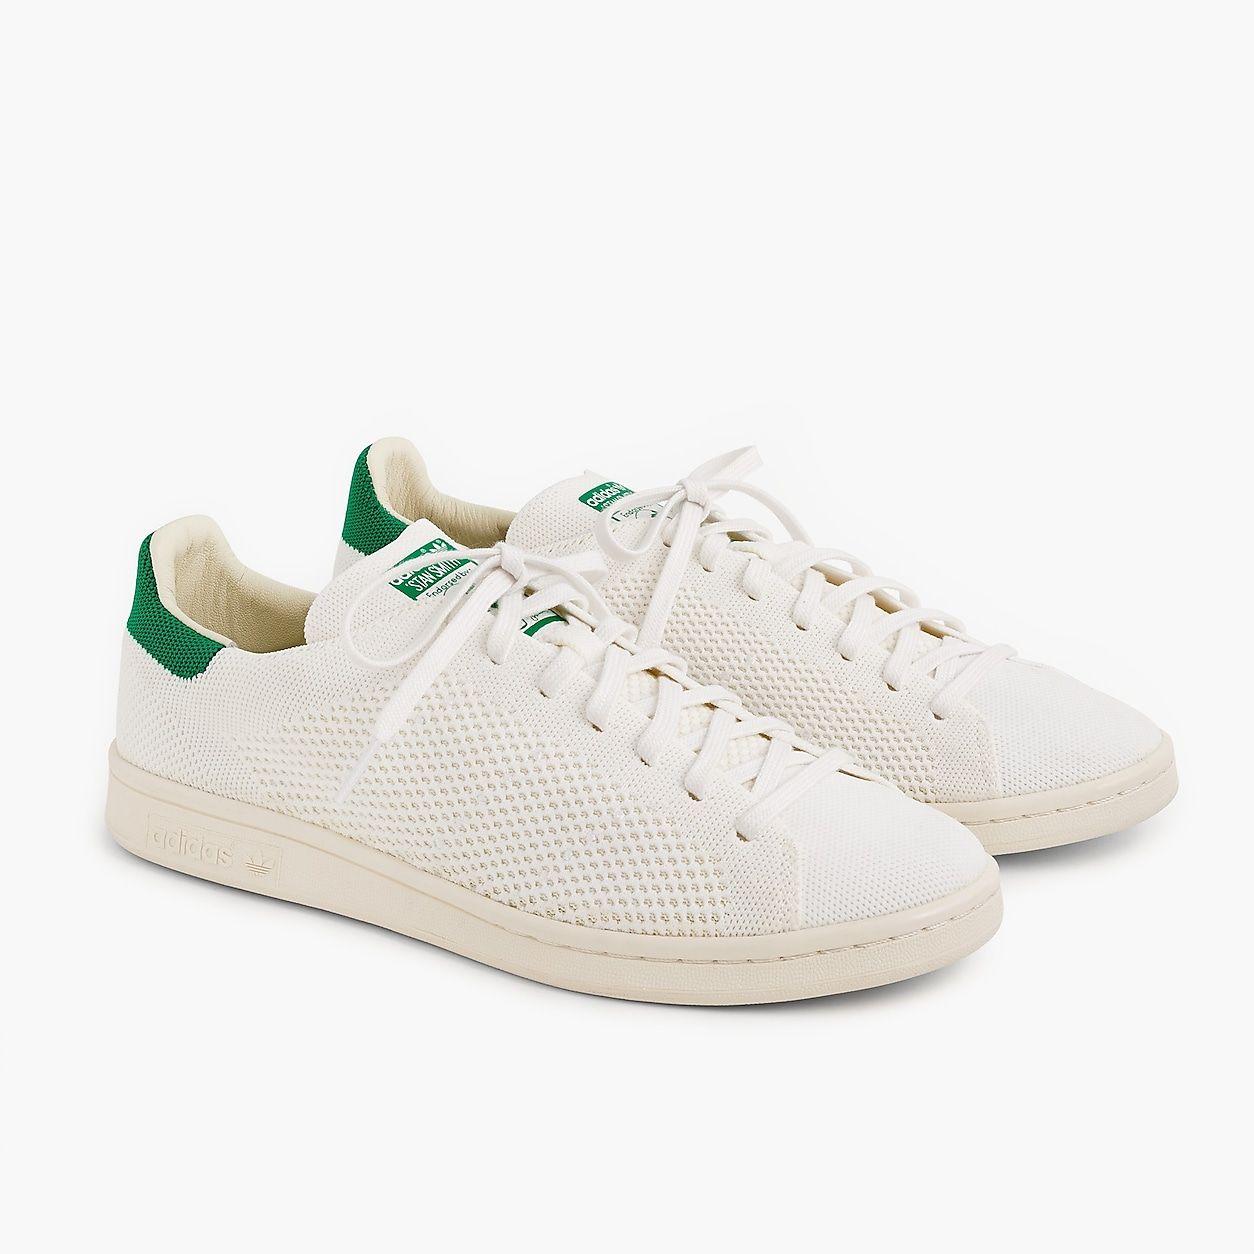 White Sneakers Adidas Court Vantage Mens White ~ Tasha Meline